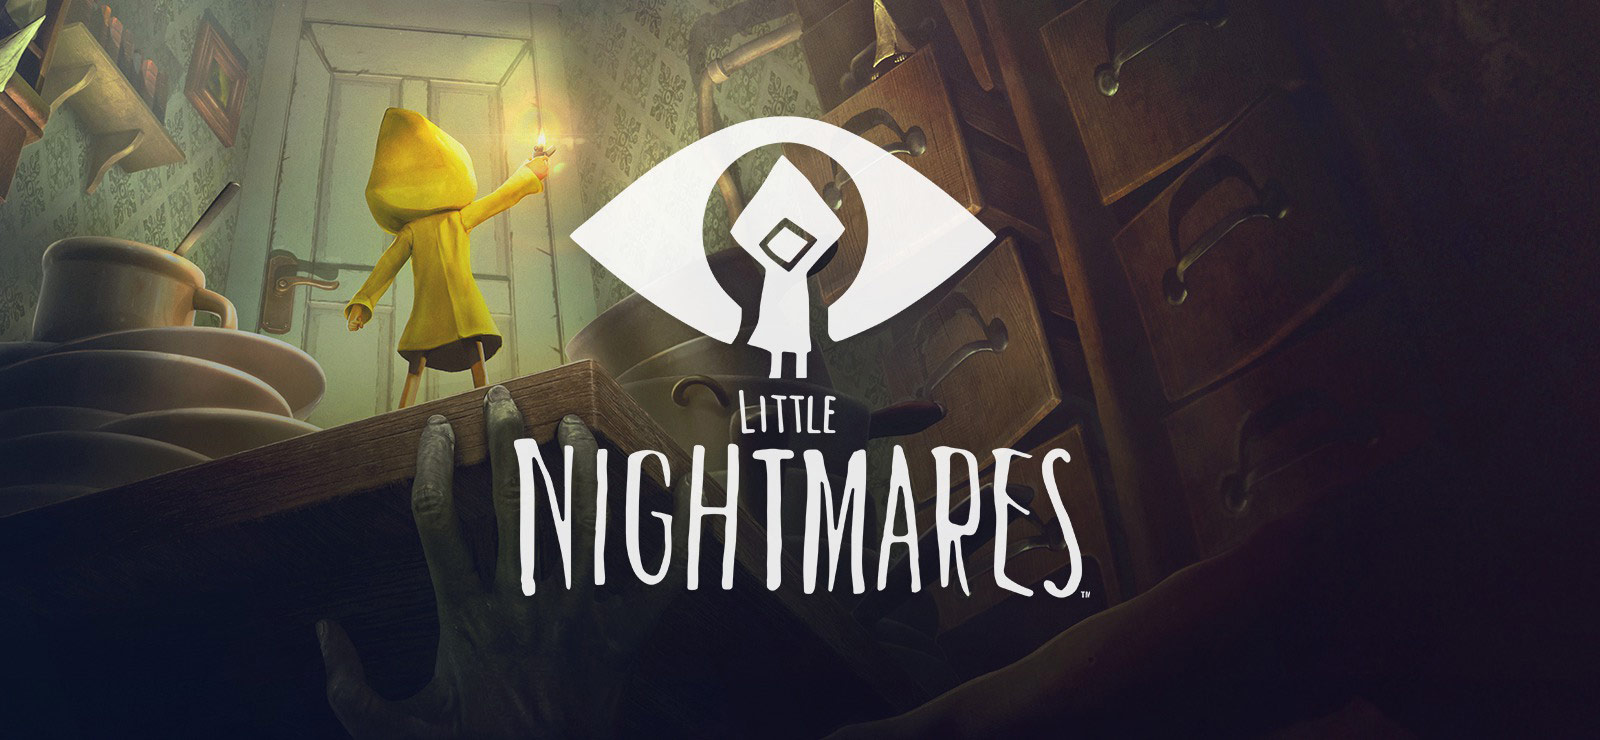 little-nightmares-img01.jpg